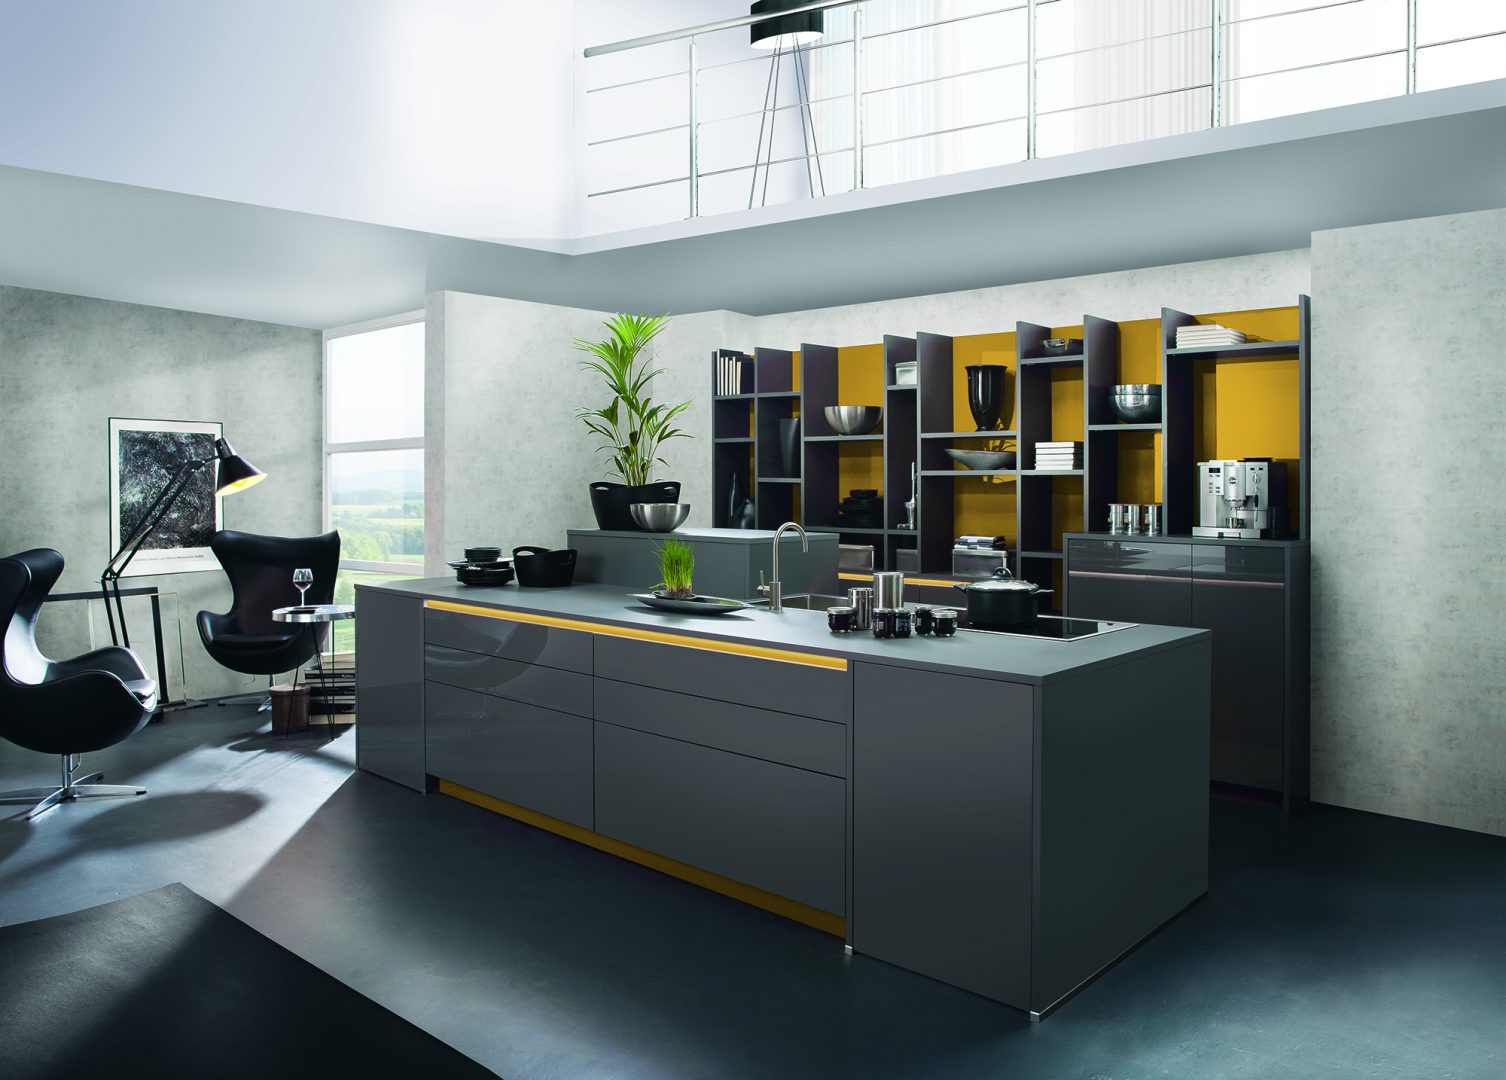 cuisine-equipee-pamplona-luxembourg-3